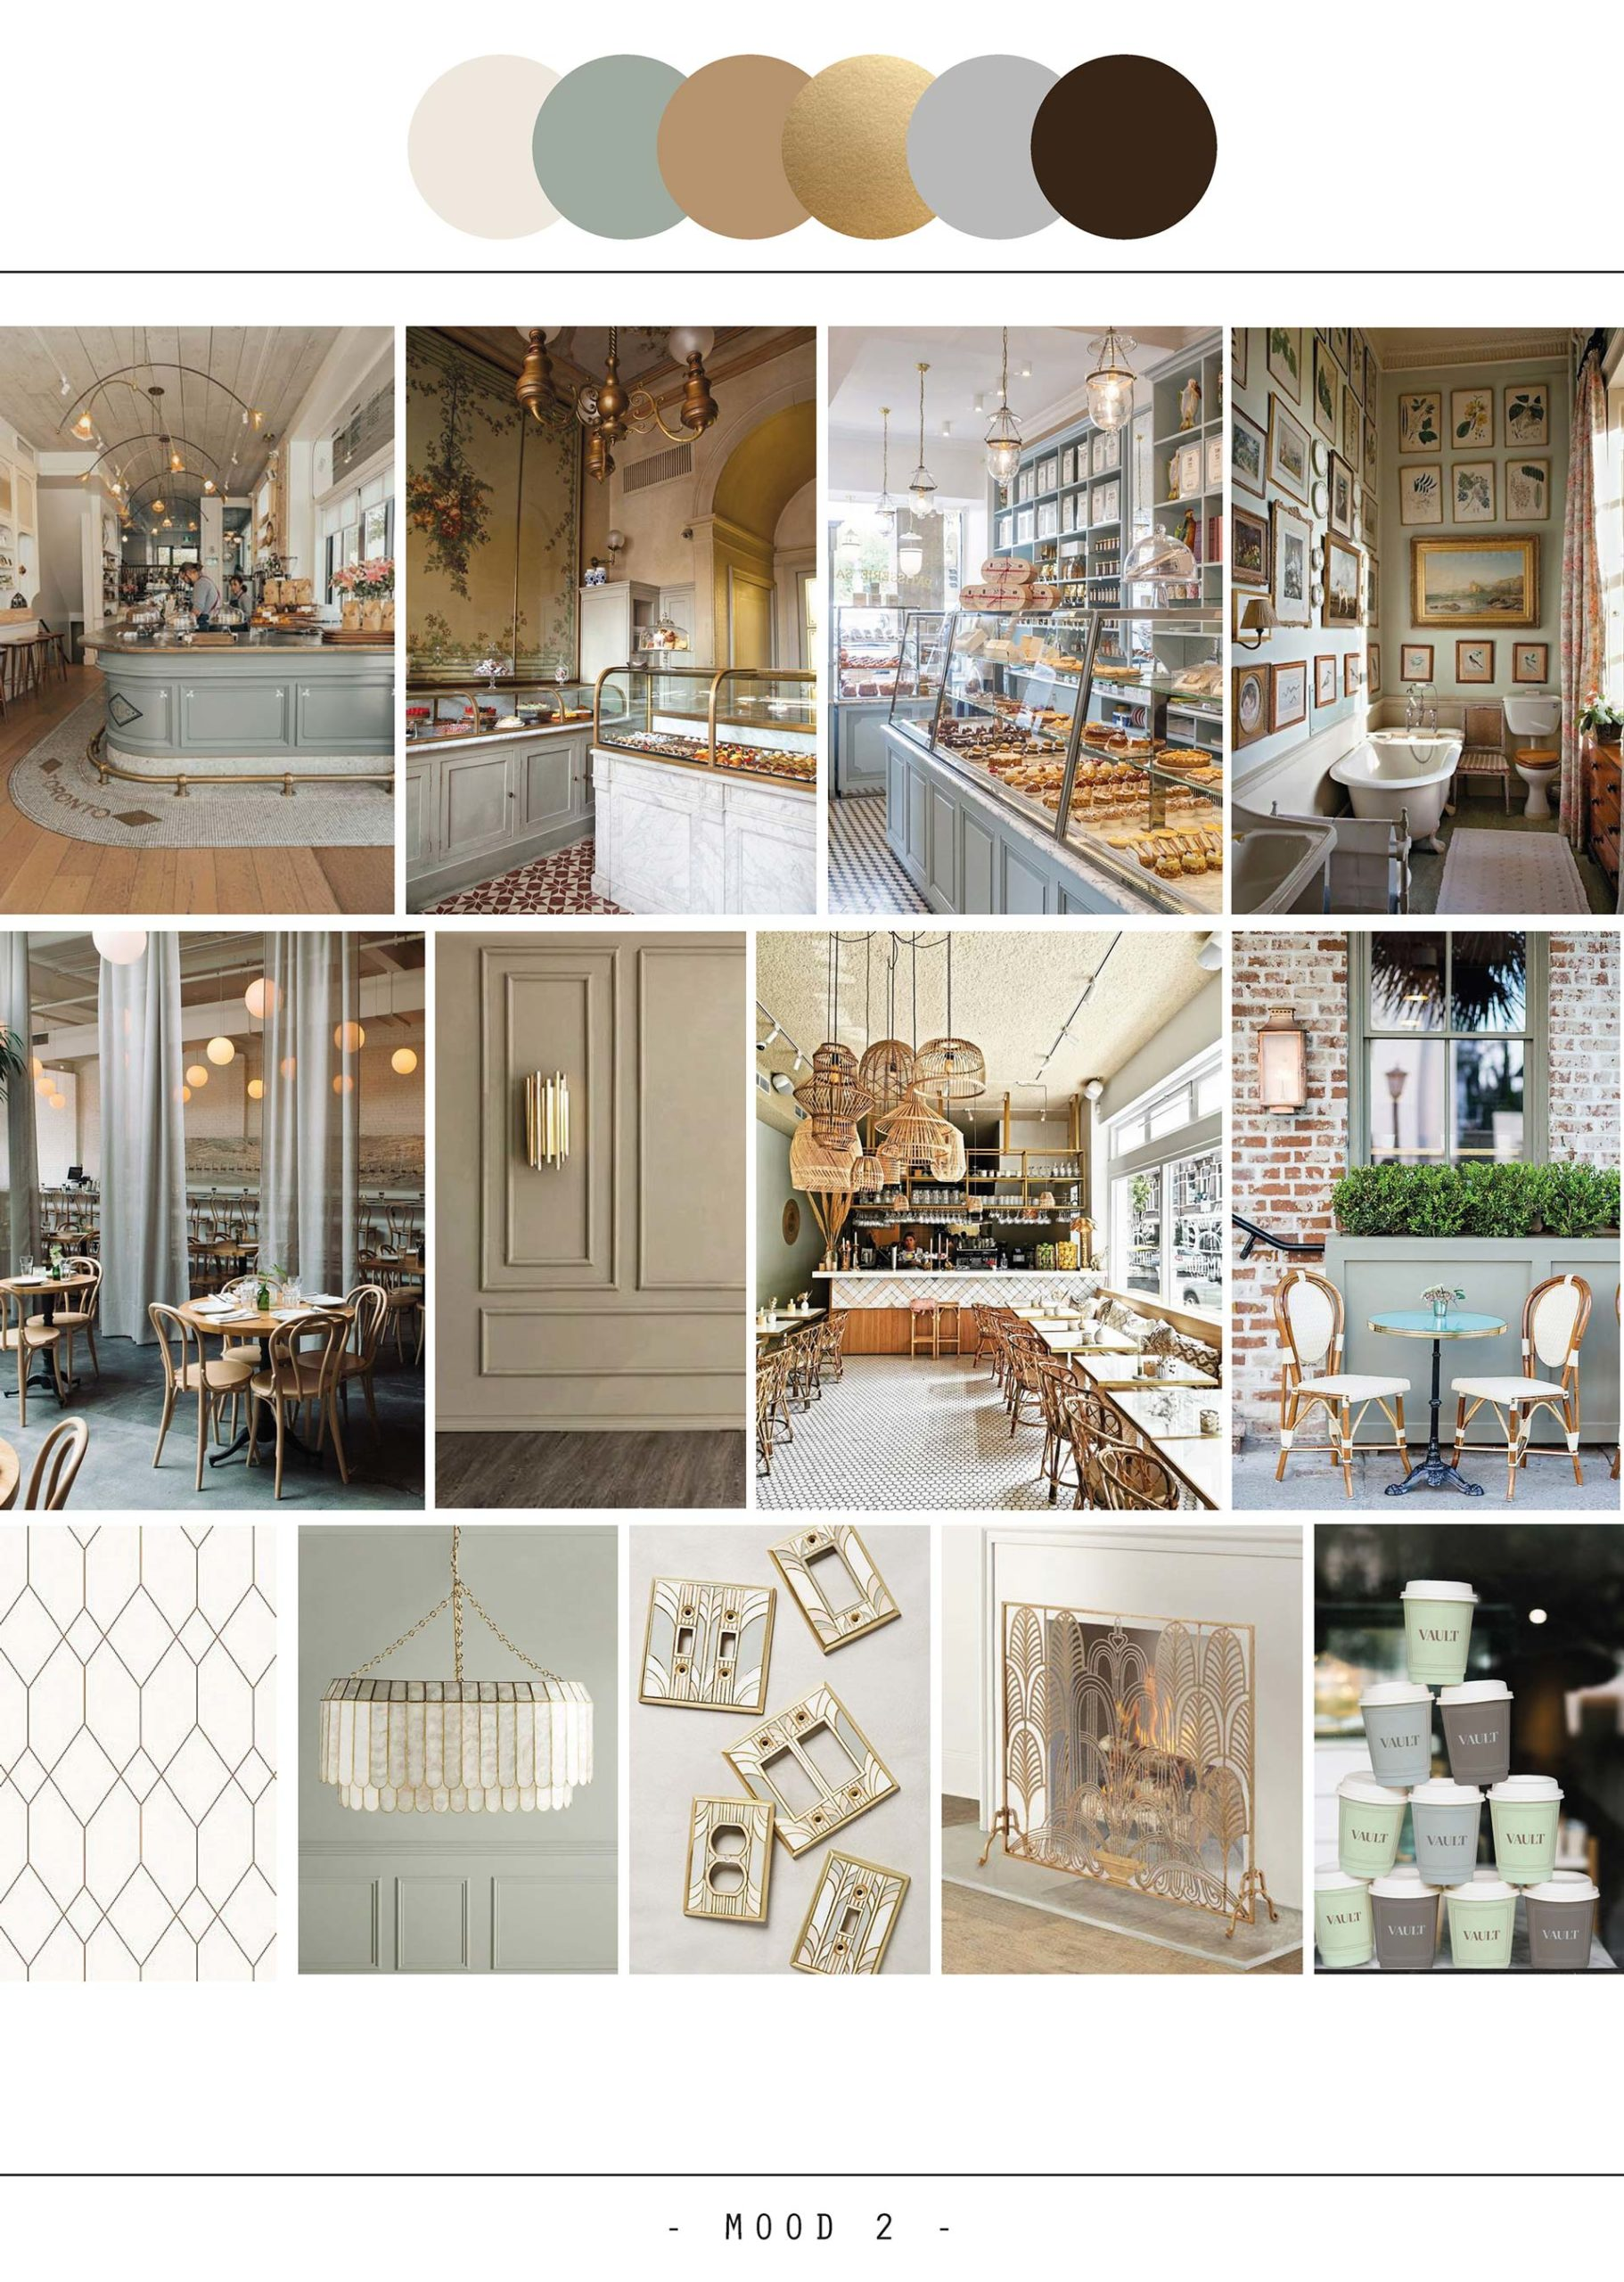 interior-mood-kaffeehaus-wittekind-2